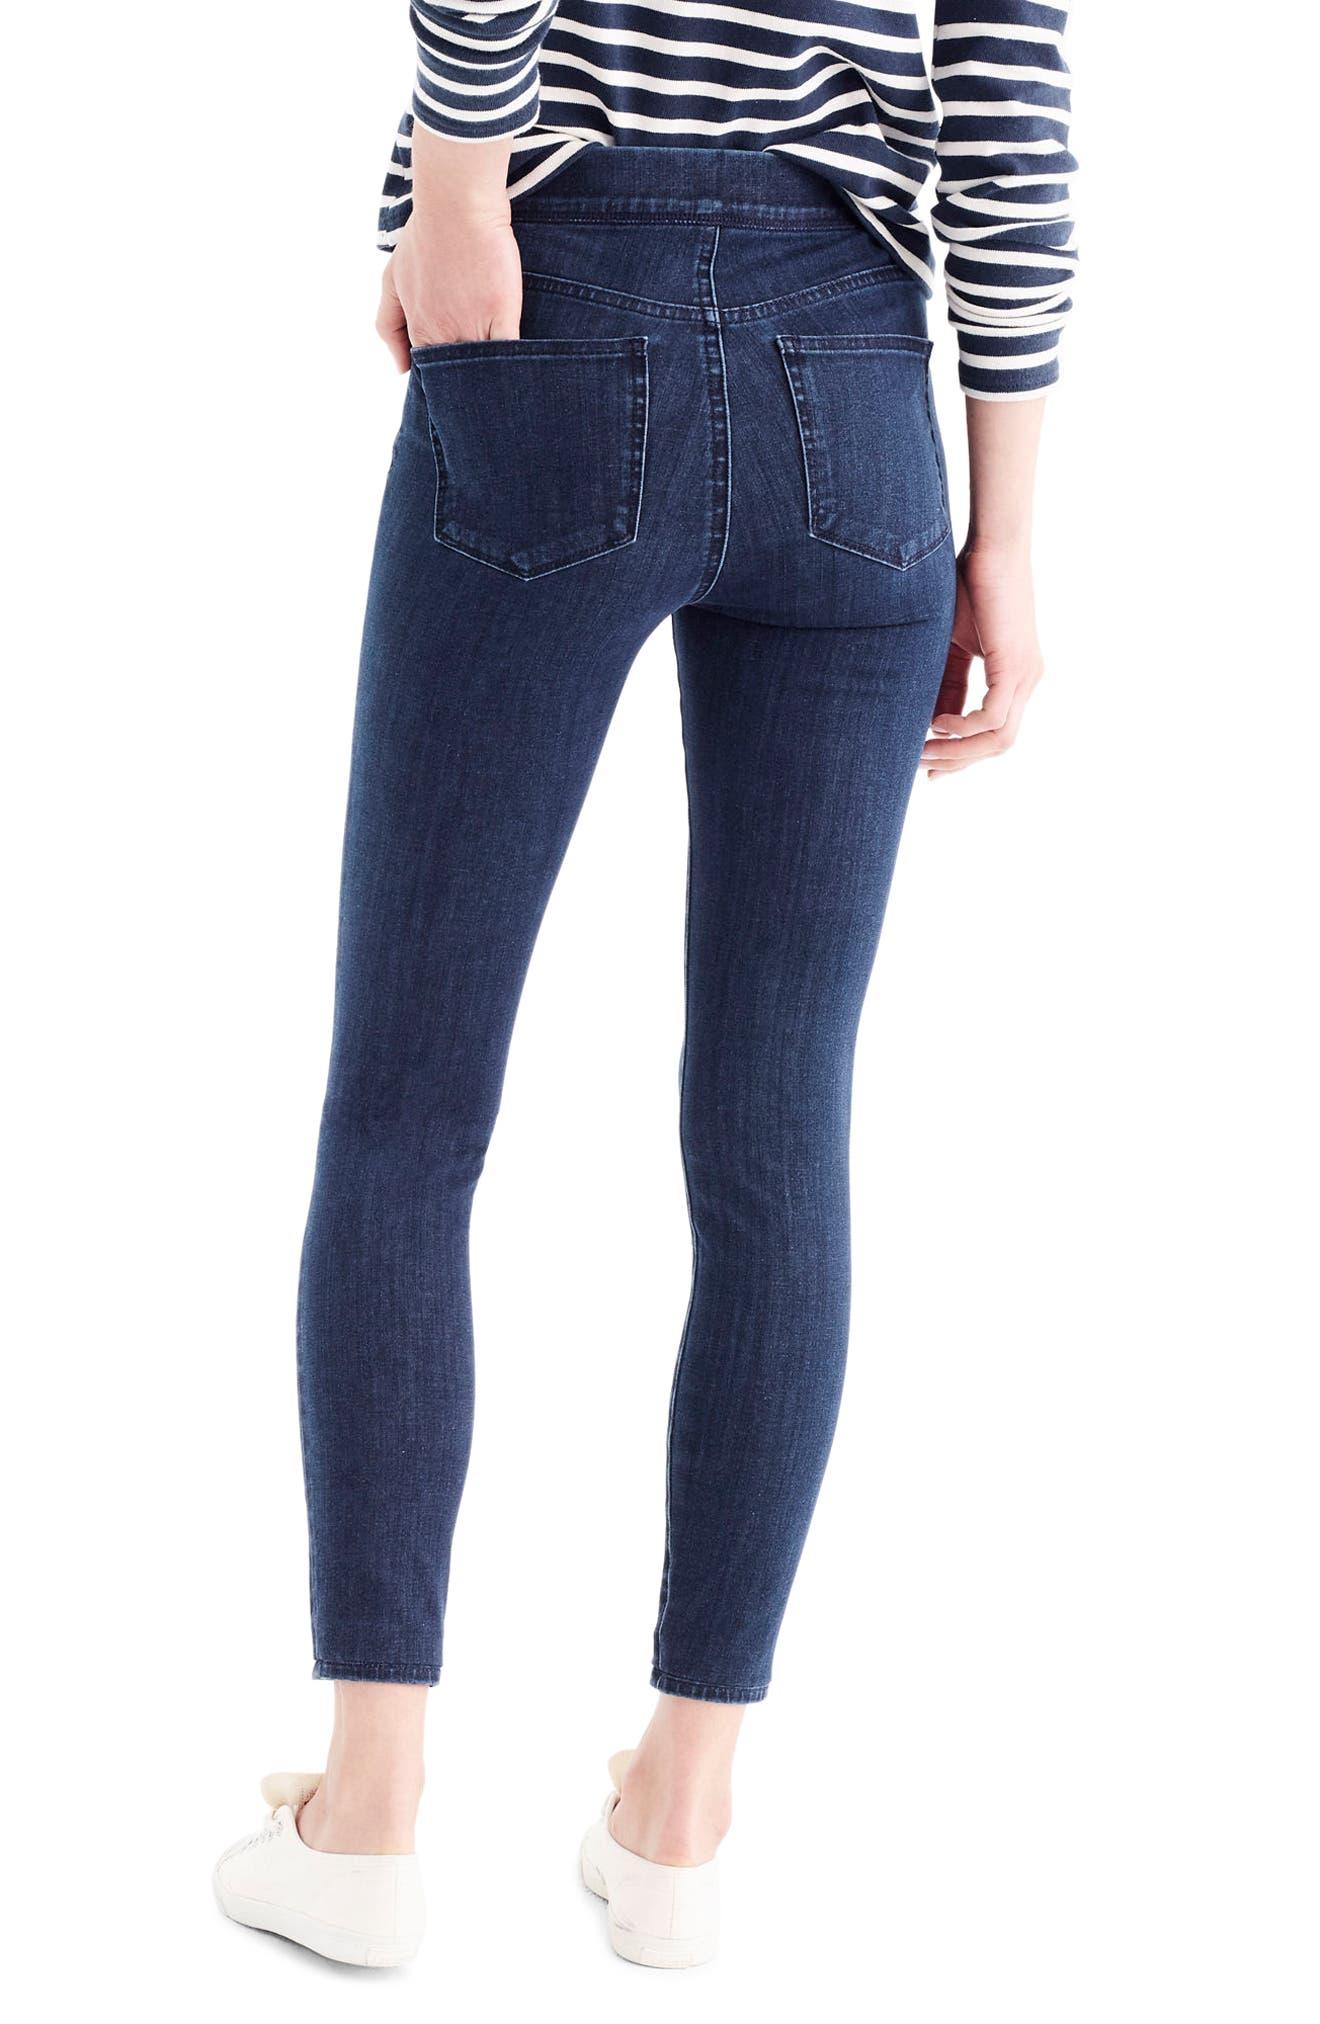 Alternate Image 2  - J.Crew Pull-On Toothpick Indigo Jeans (Regular & Petite)